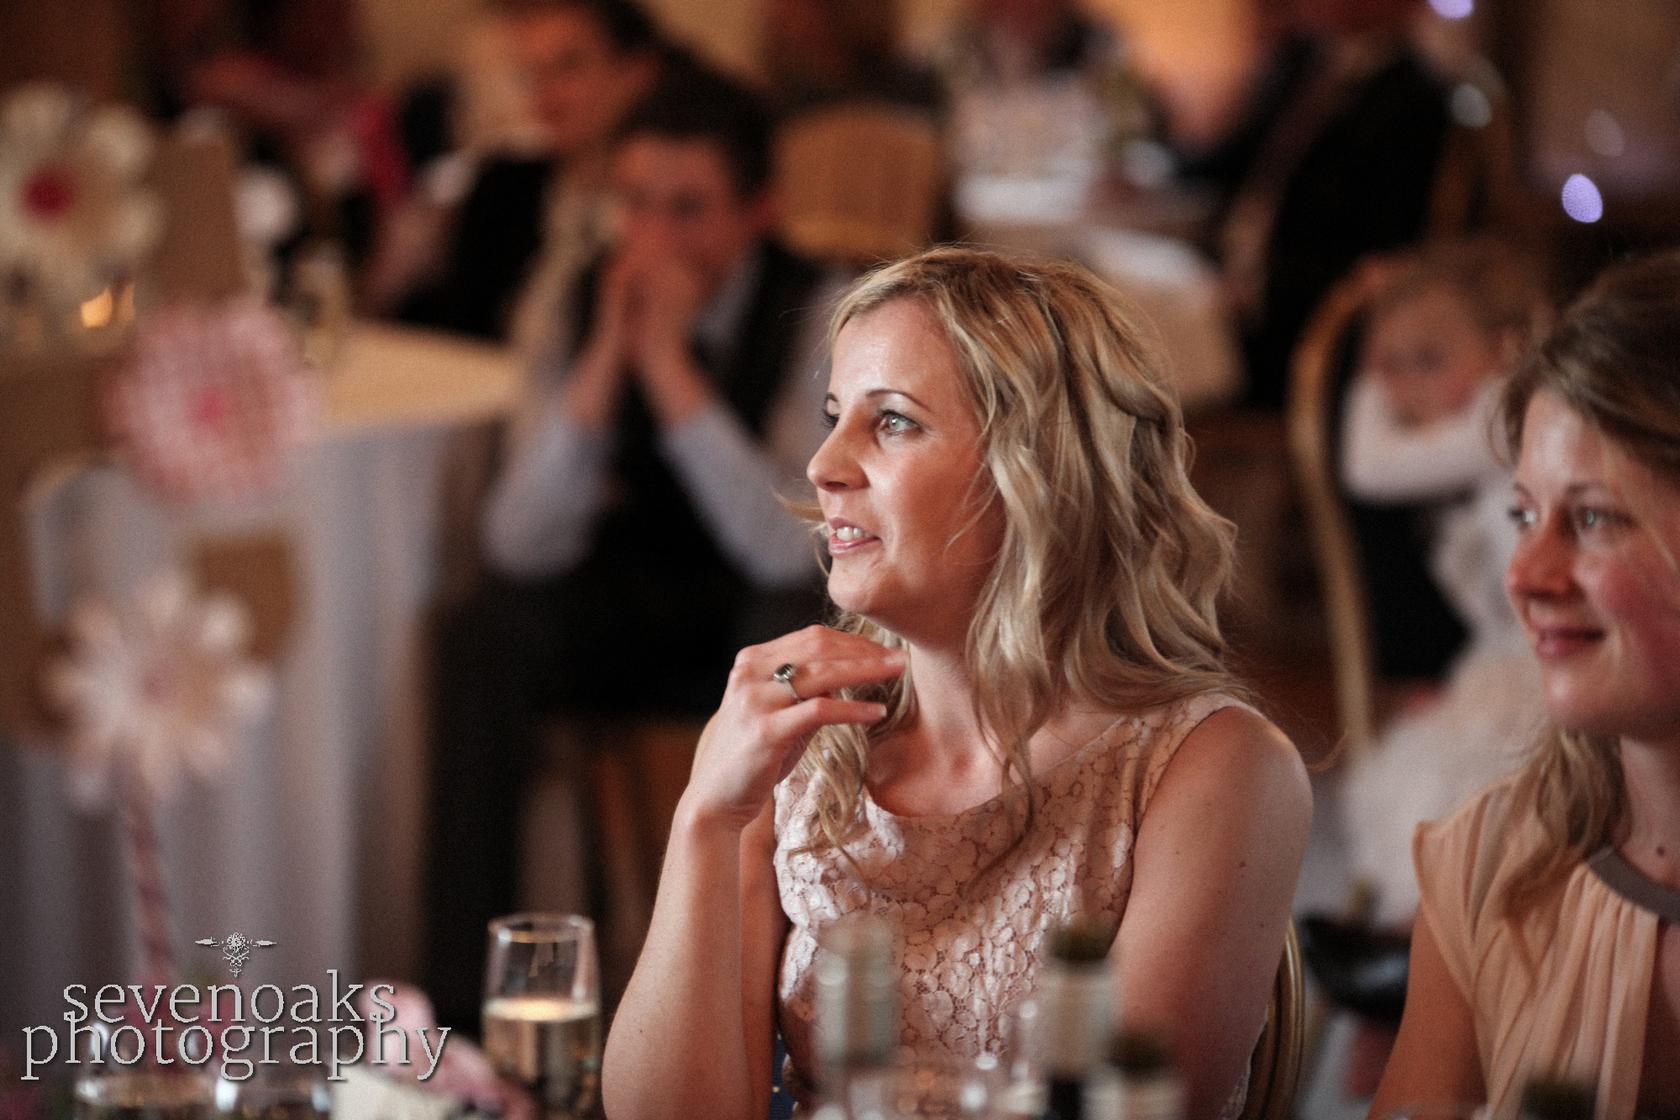 Sevenoaks documentary wedding photographer-57.jpg